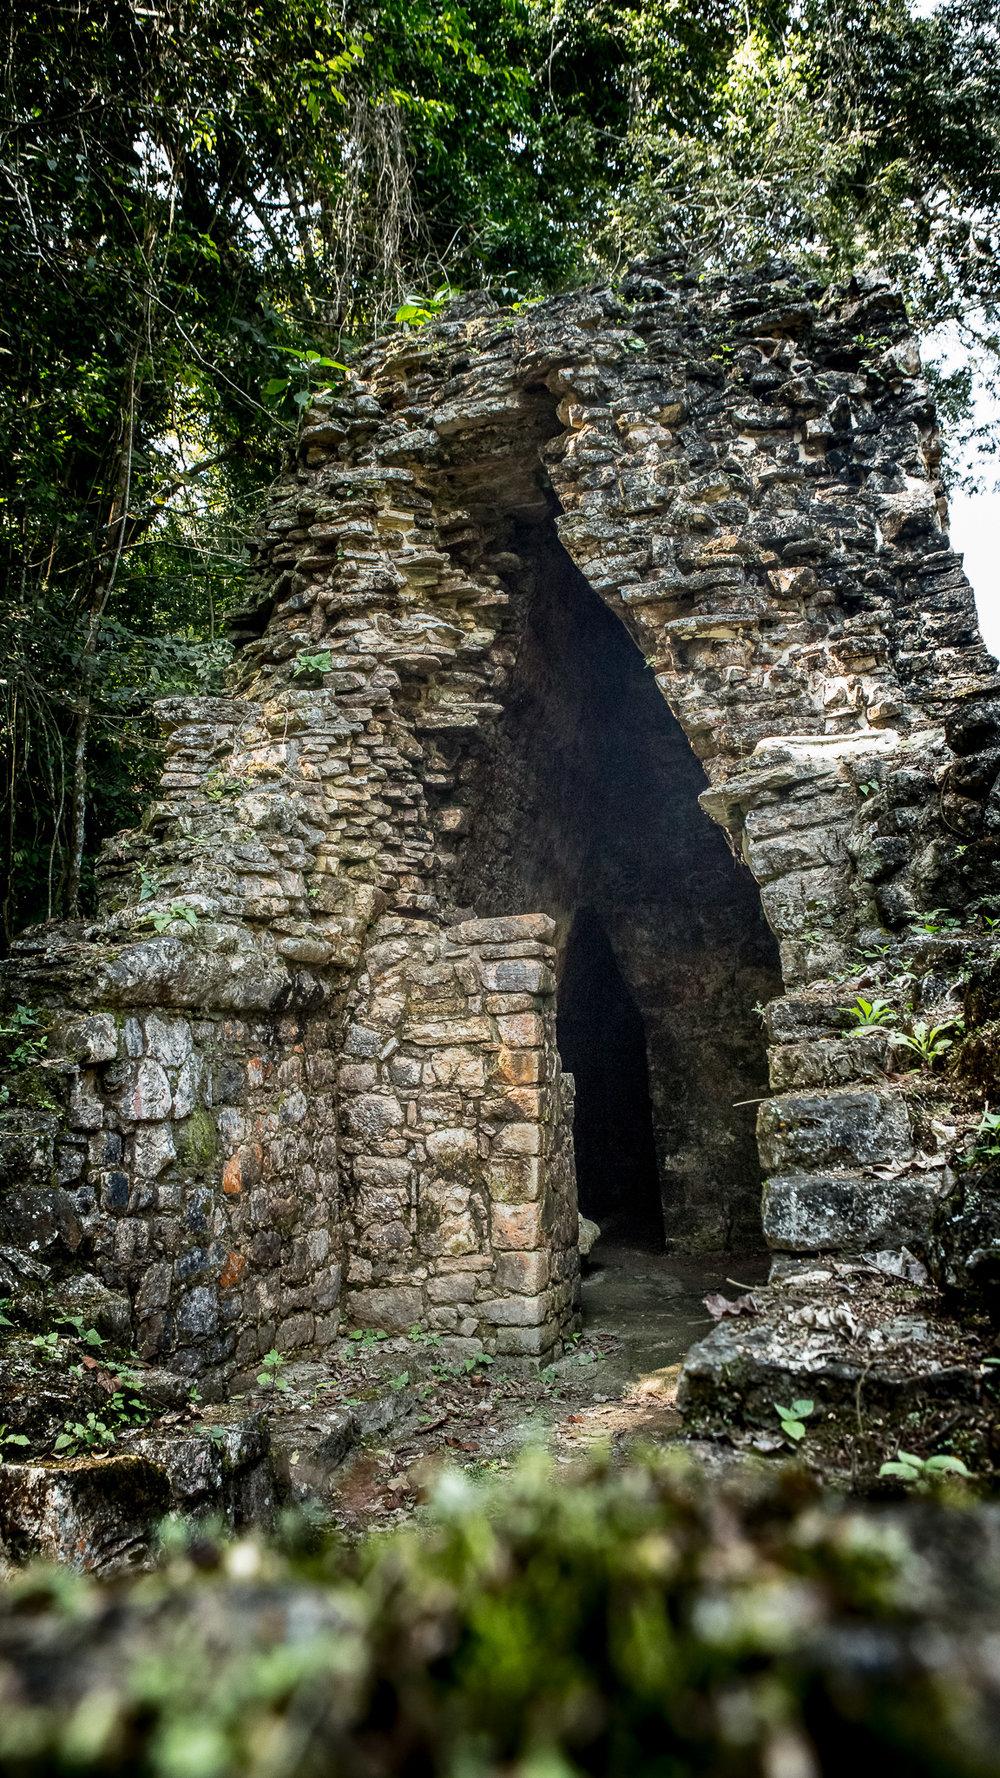 2017 - ChiapasTrip_D3_54992017 - 51.jpg